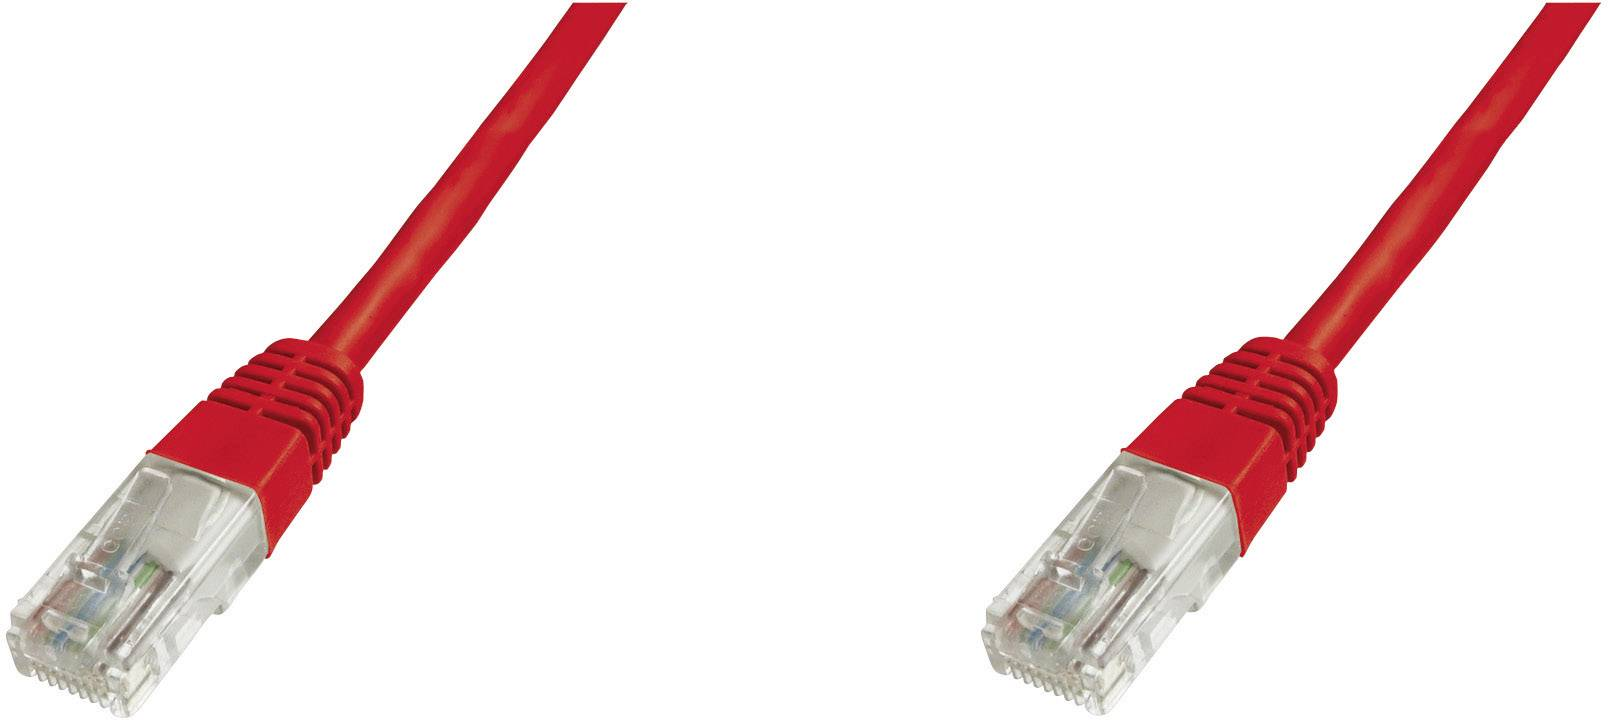 Síťový kabel RJ45 Digitus Professional DK-1511-010/R, CAT 5e, U/UTP, 1 m, červená